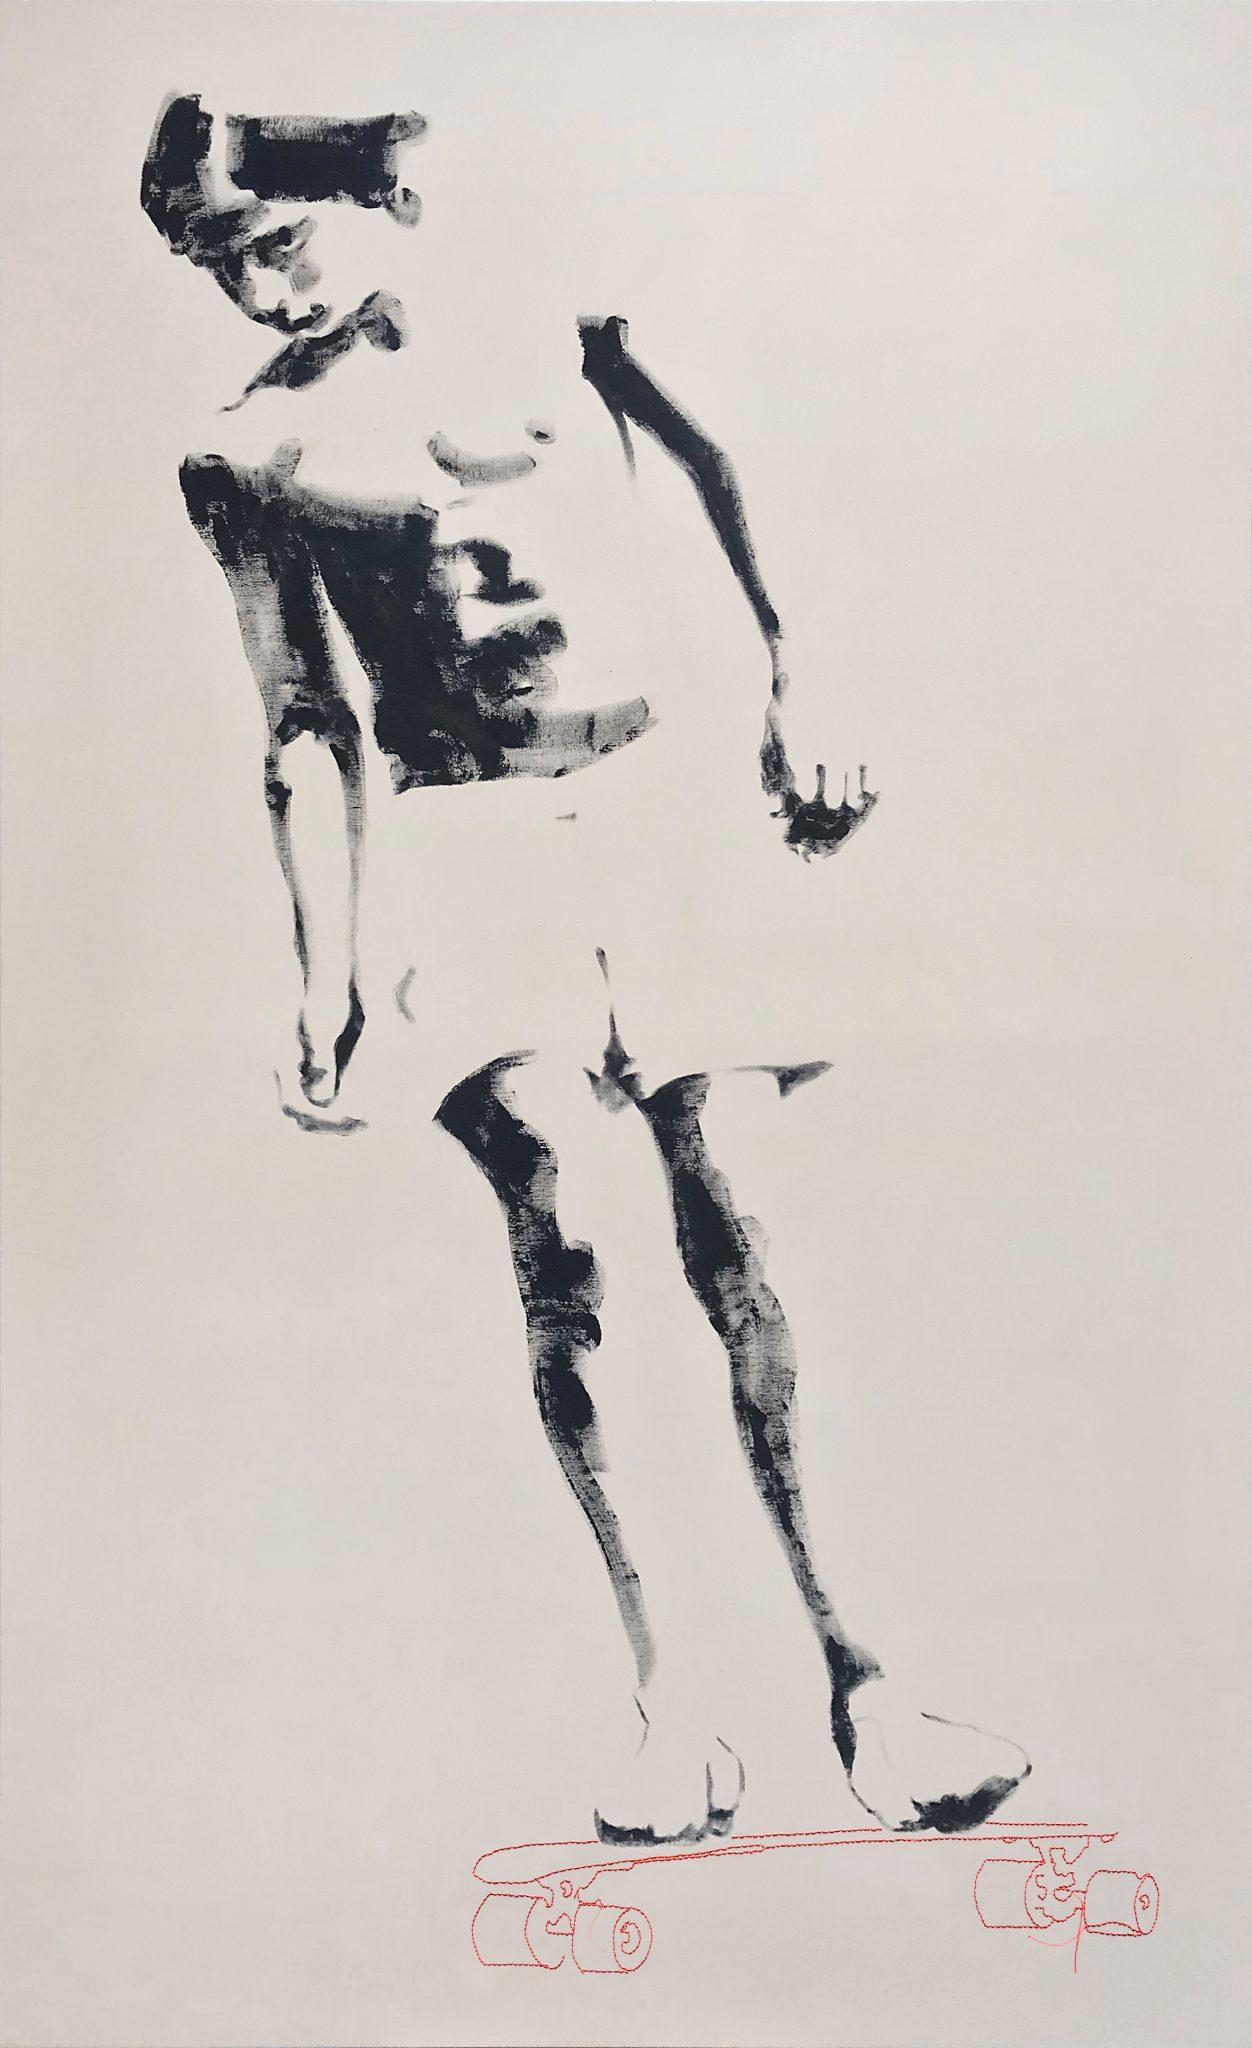 Drifting 180x110 cm acrylics on canvas #SOLD